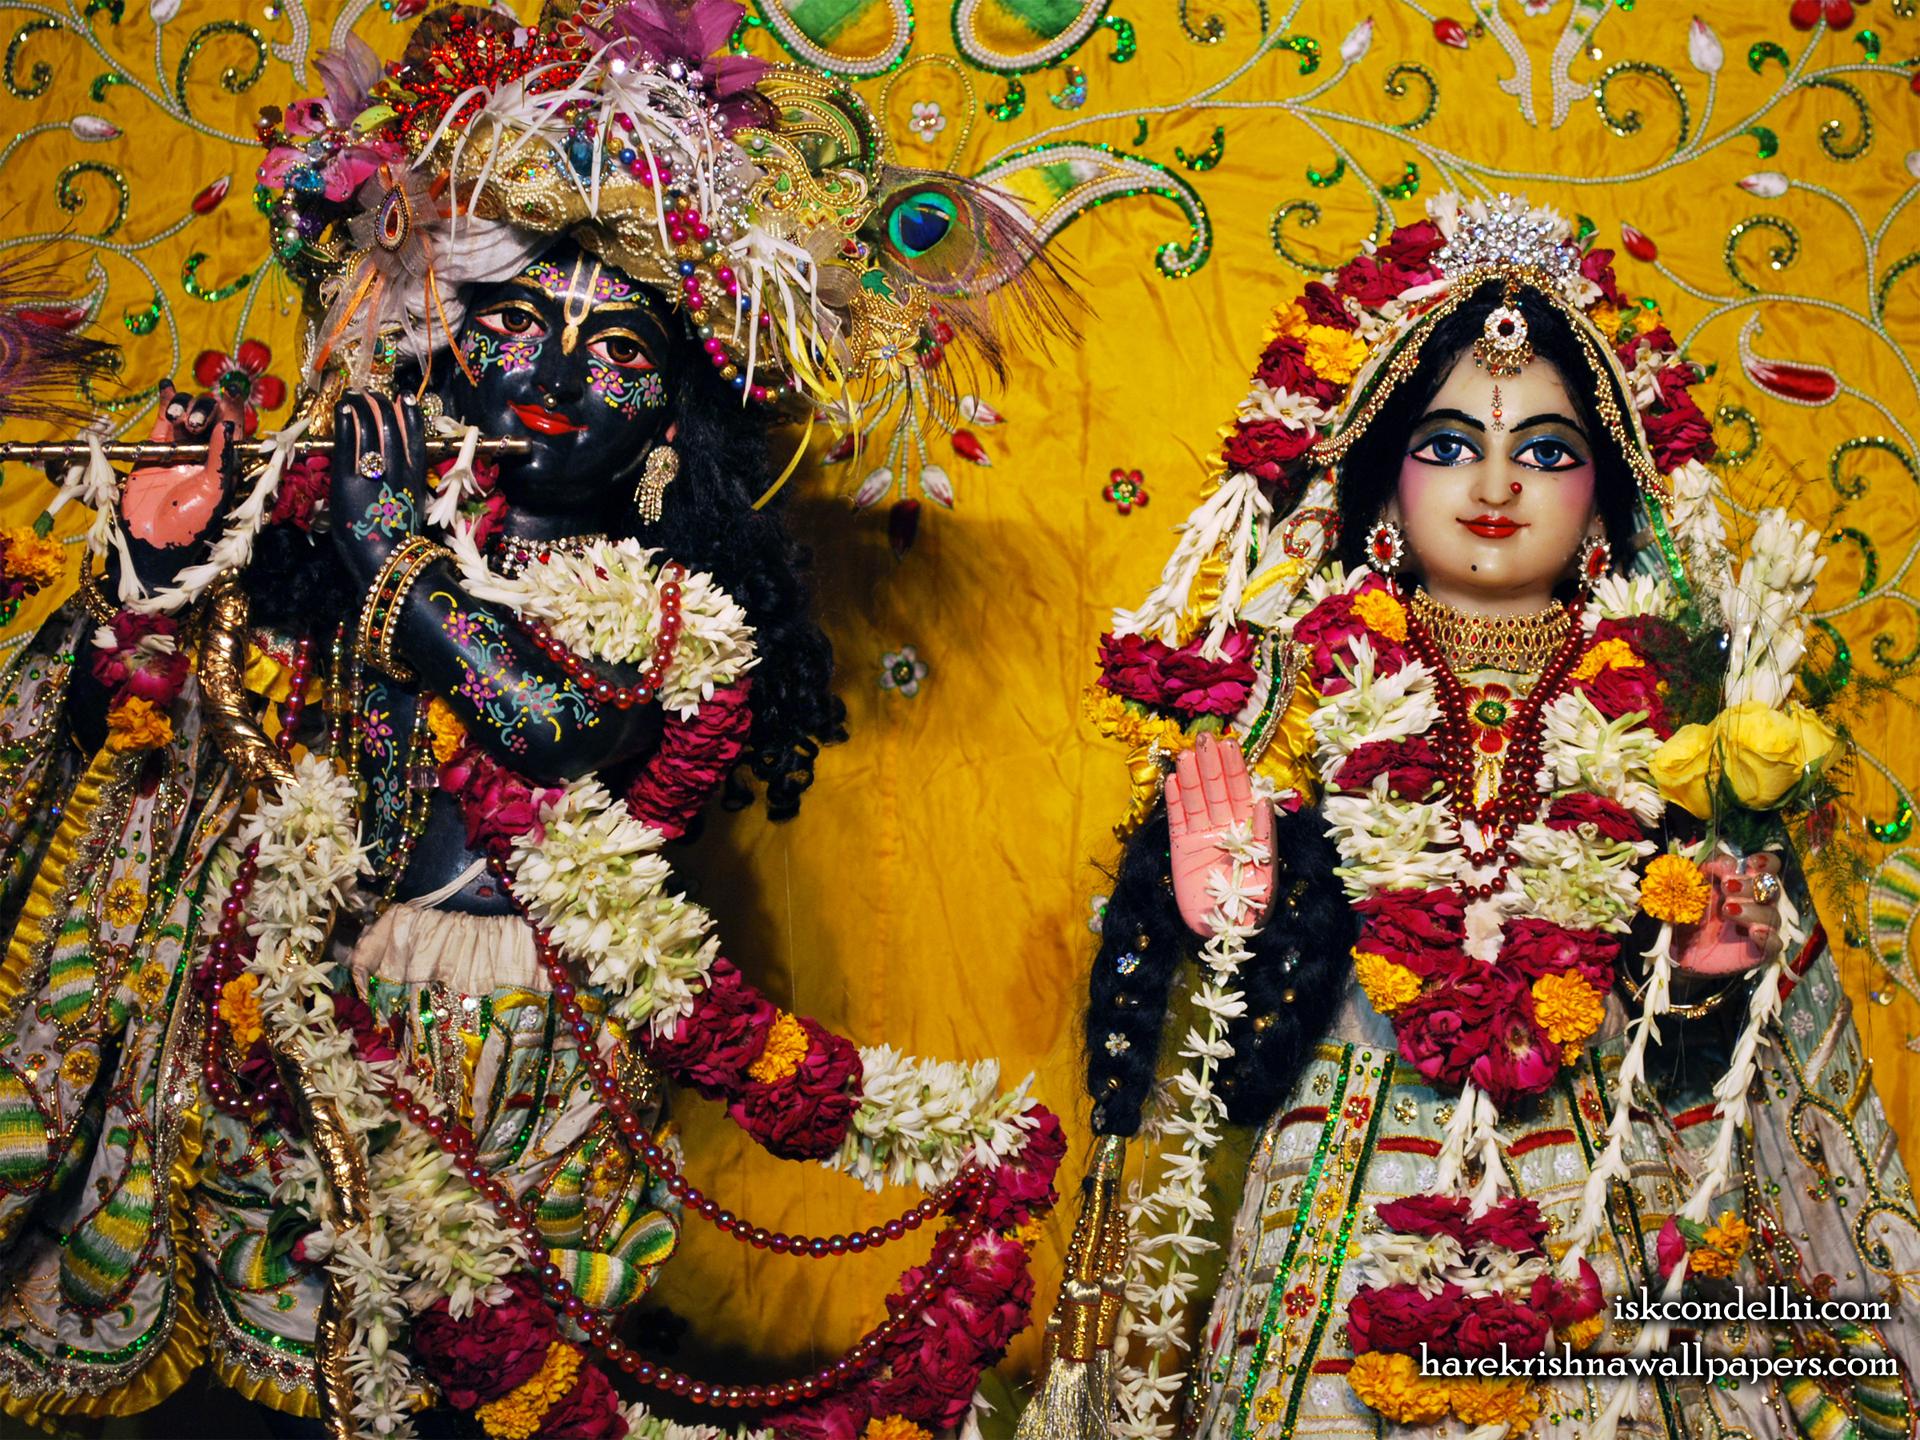 Sri Sri Radha Parthasarathi Close up Wallpaper (010) Size 1920x1440 Download